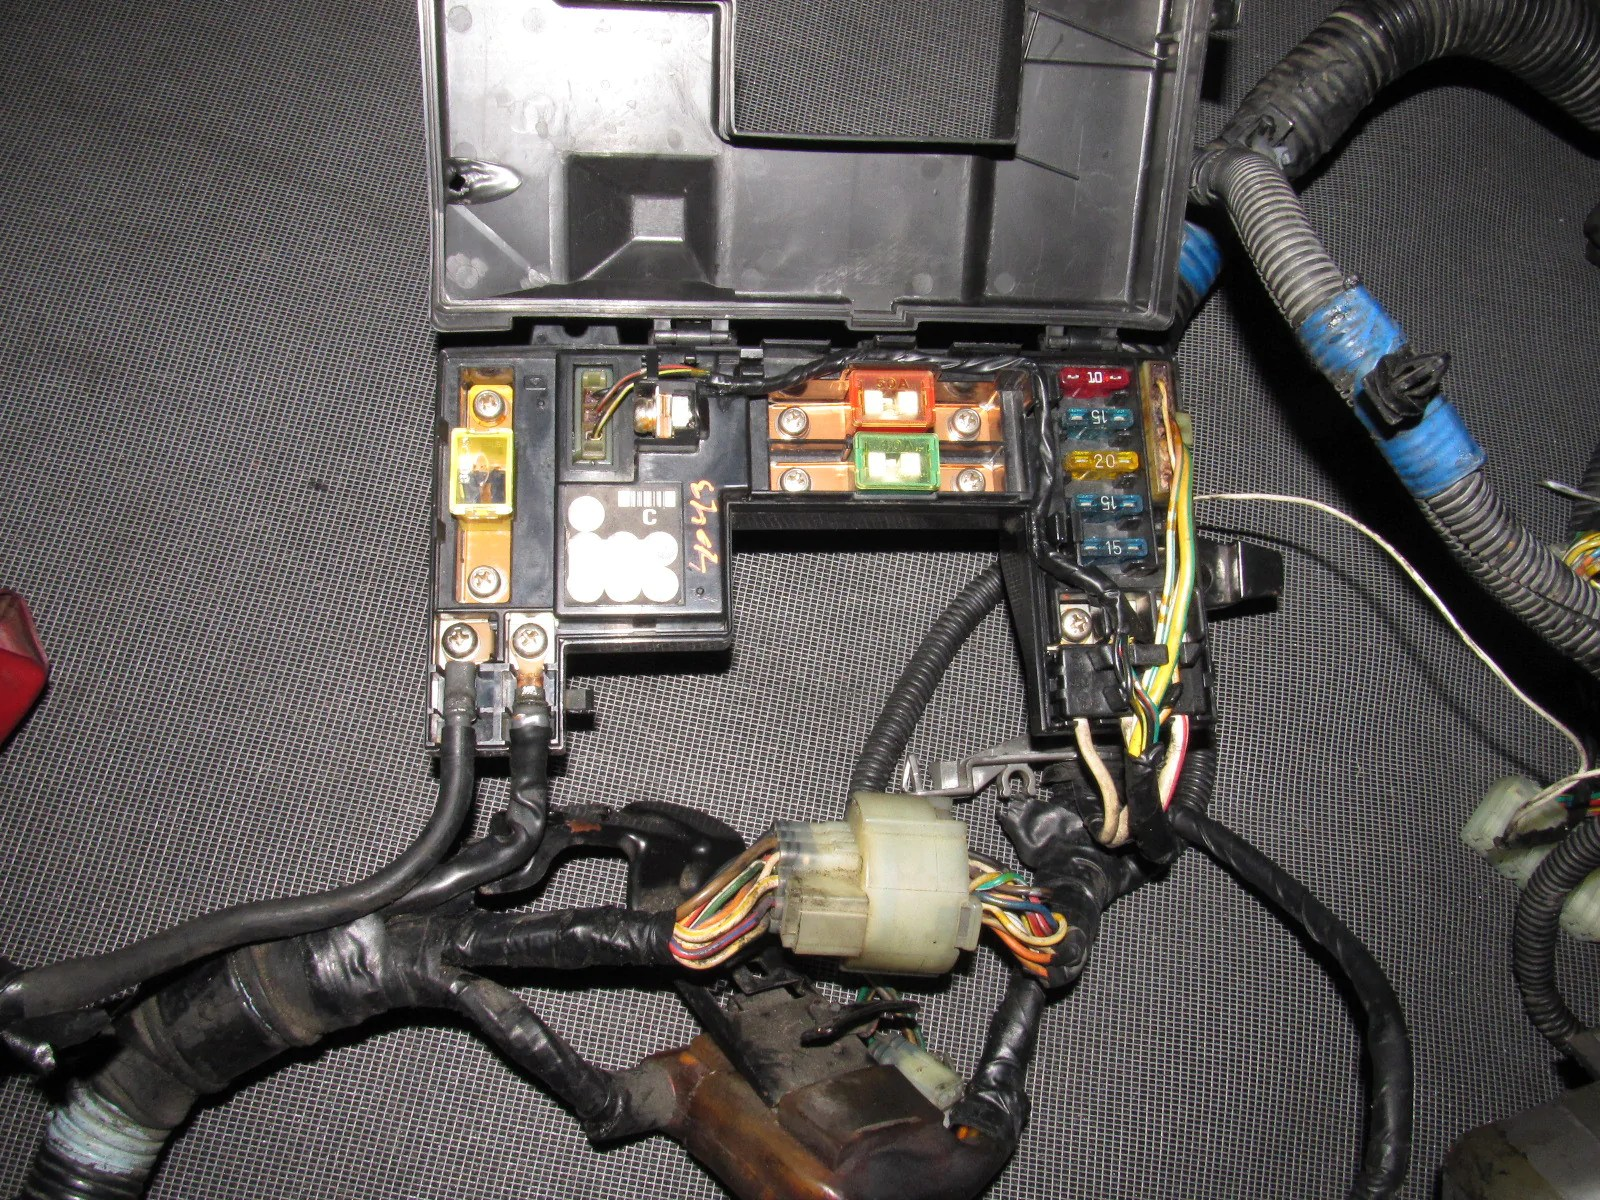 medium resolution of 88 89 honda crx oem d15b2 engine wiring harness autopartone com eclipse wiring harness honda crx wiring harness